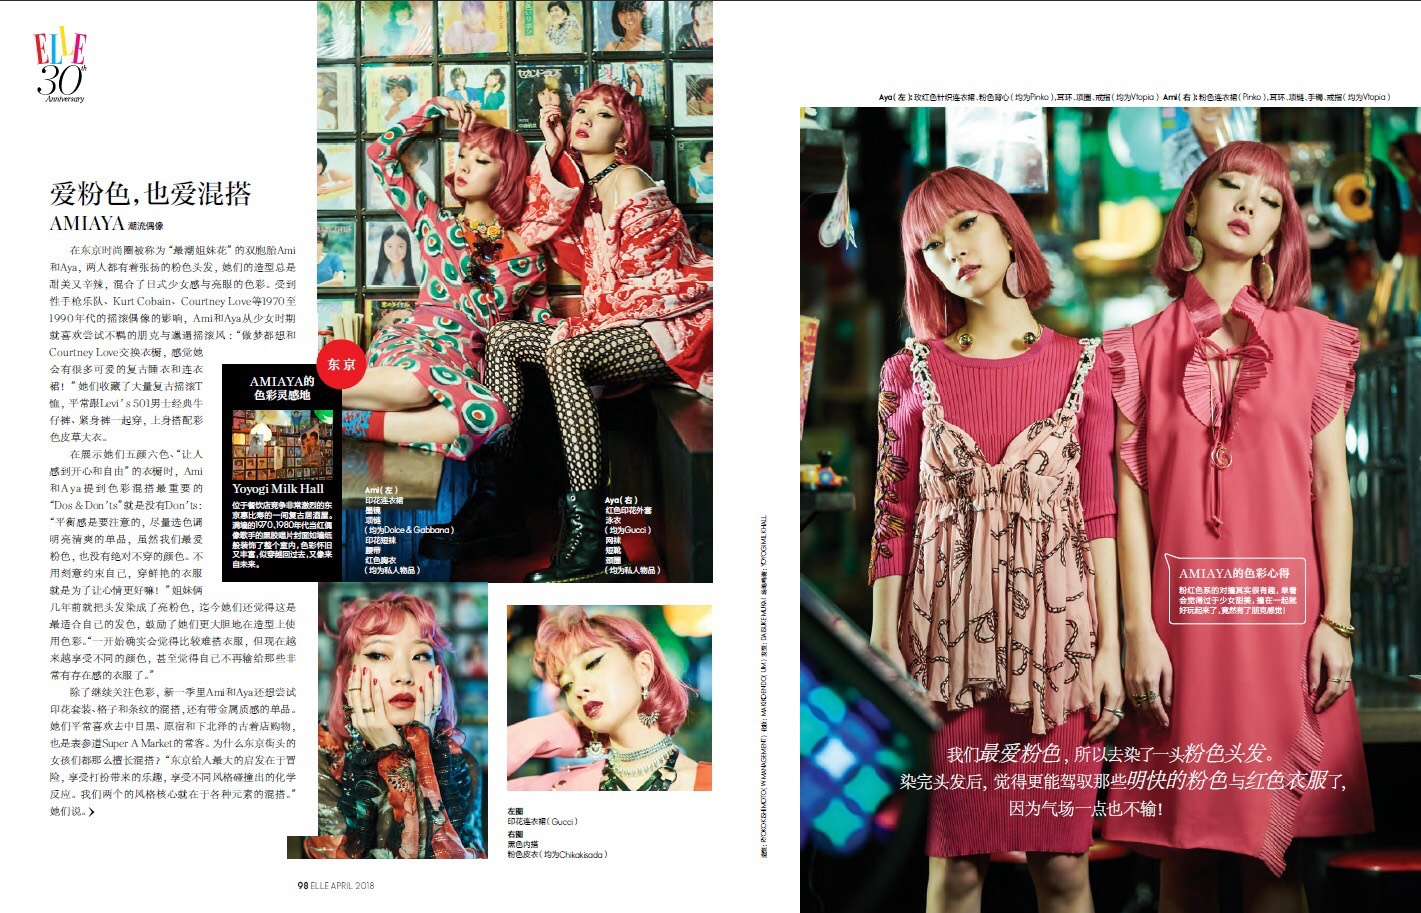 ELLE China x AMIAYA  30's Anniversary issue